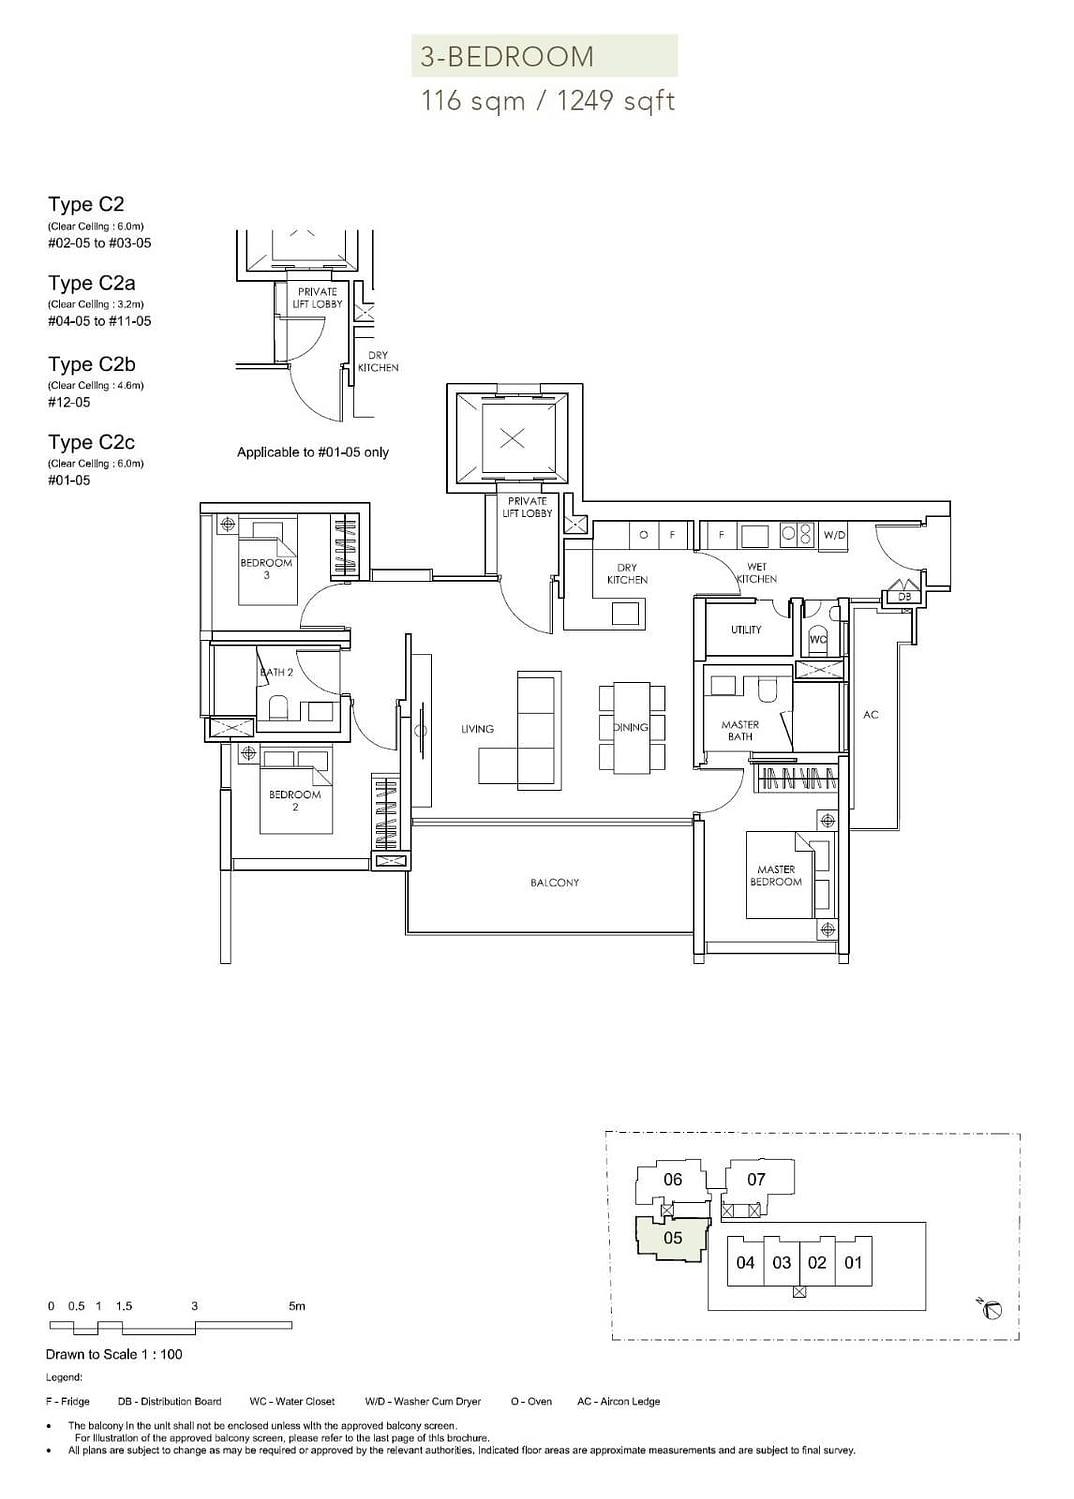 Sloane Residences Sloane Residences Floorplan C2b